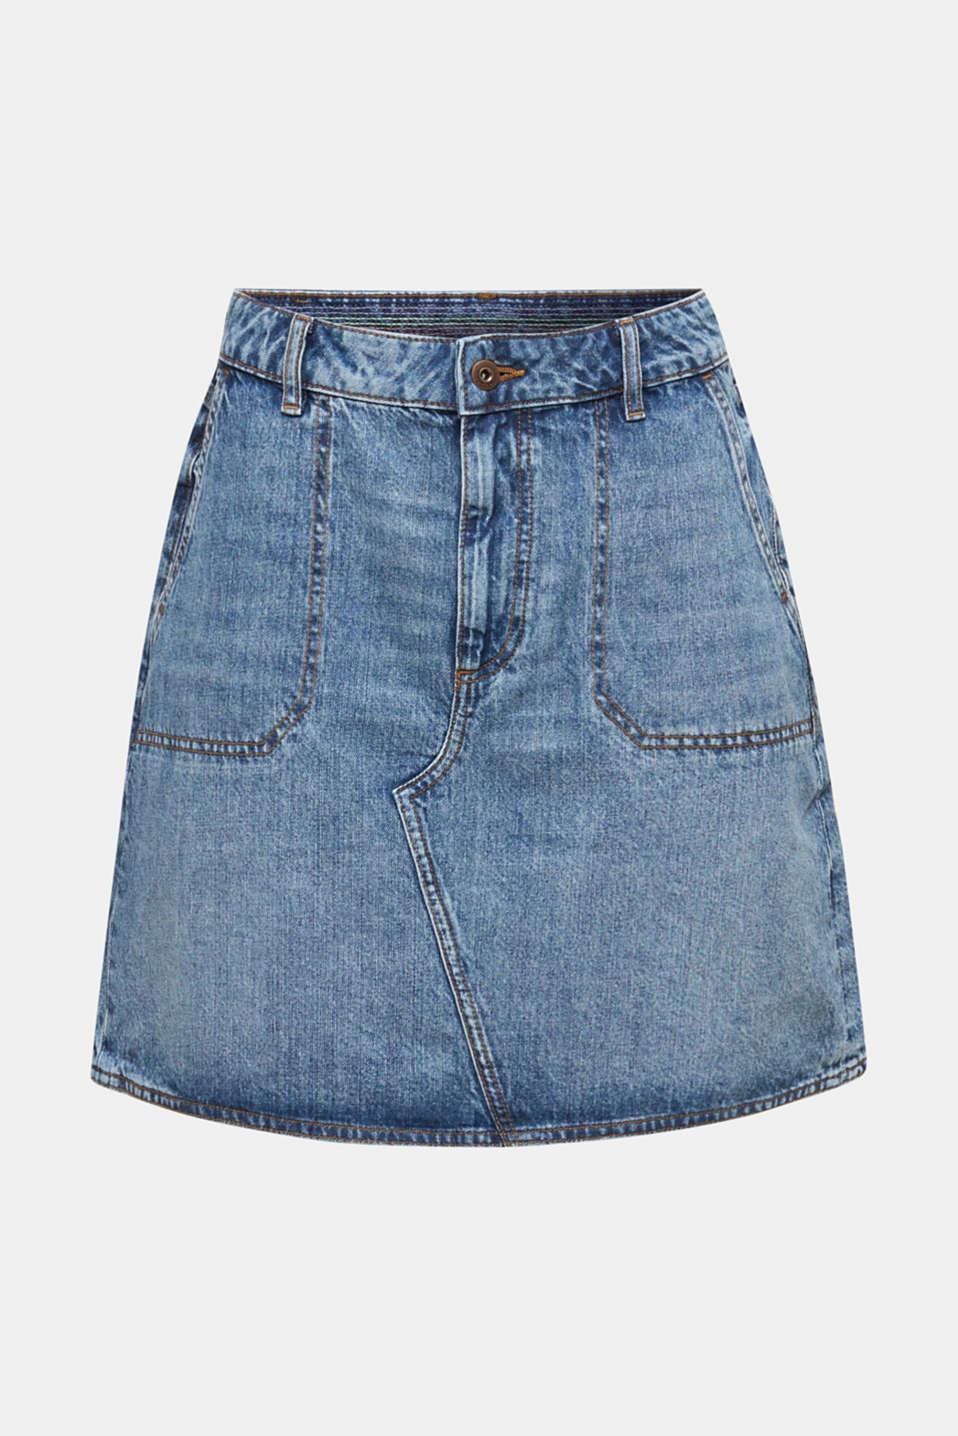 Bleached denim skirt, 100% cotton, BLUE MEDIUM WASH, detail image number 6